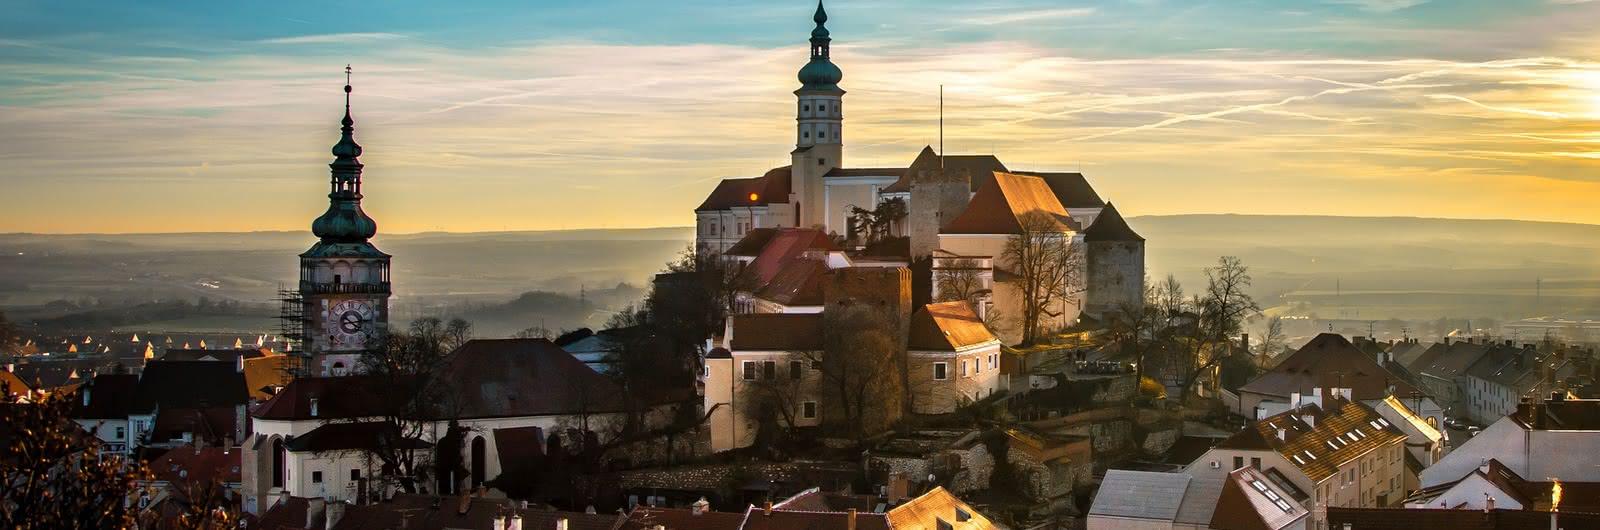 Česká republika panorama